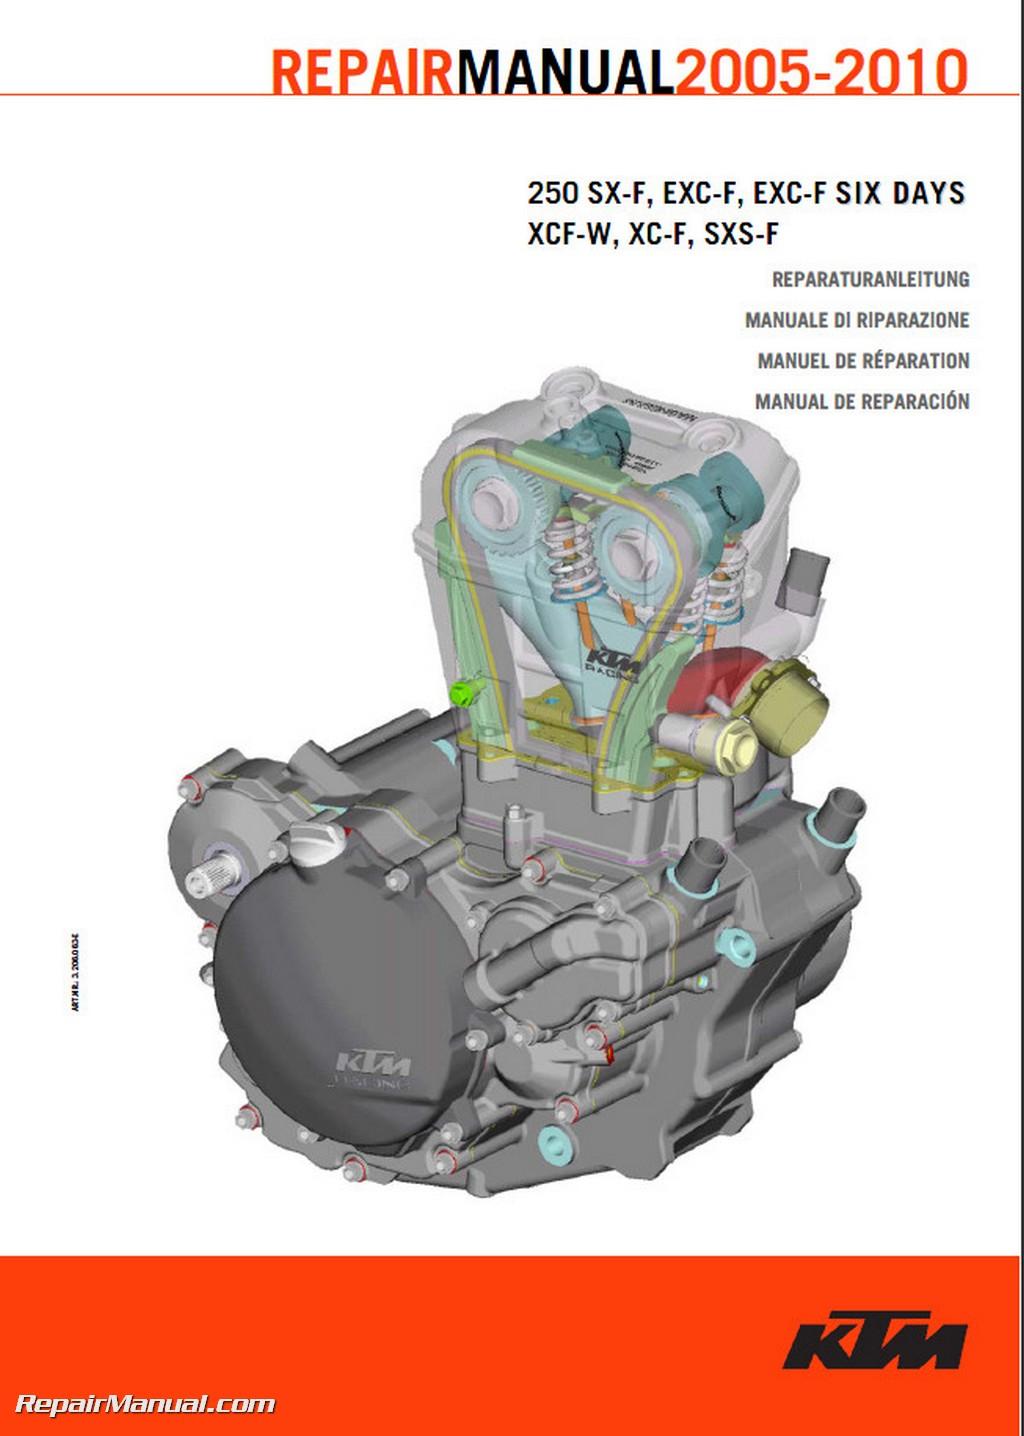 1997 ktm 250 exc service manual